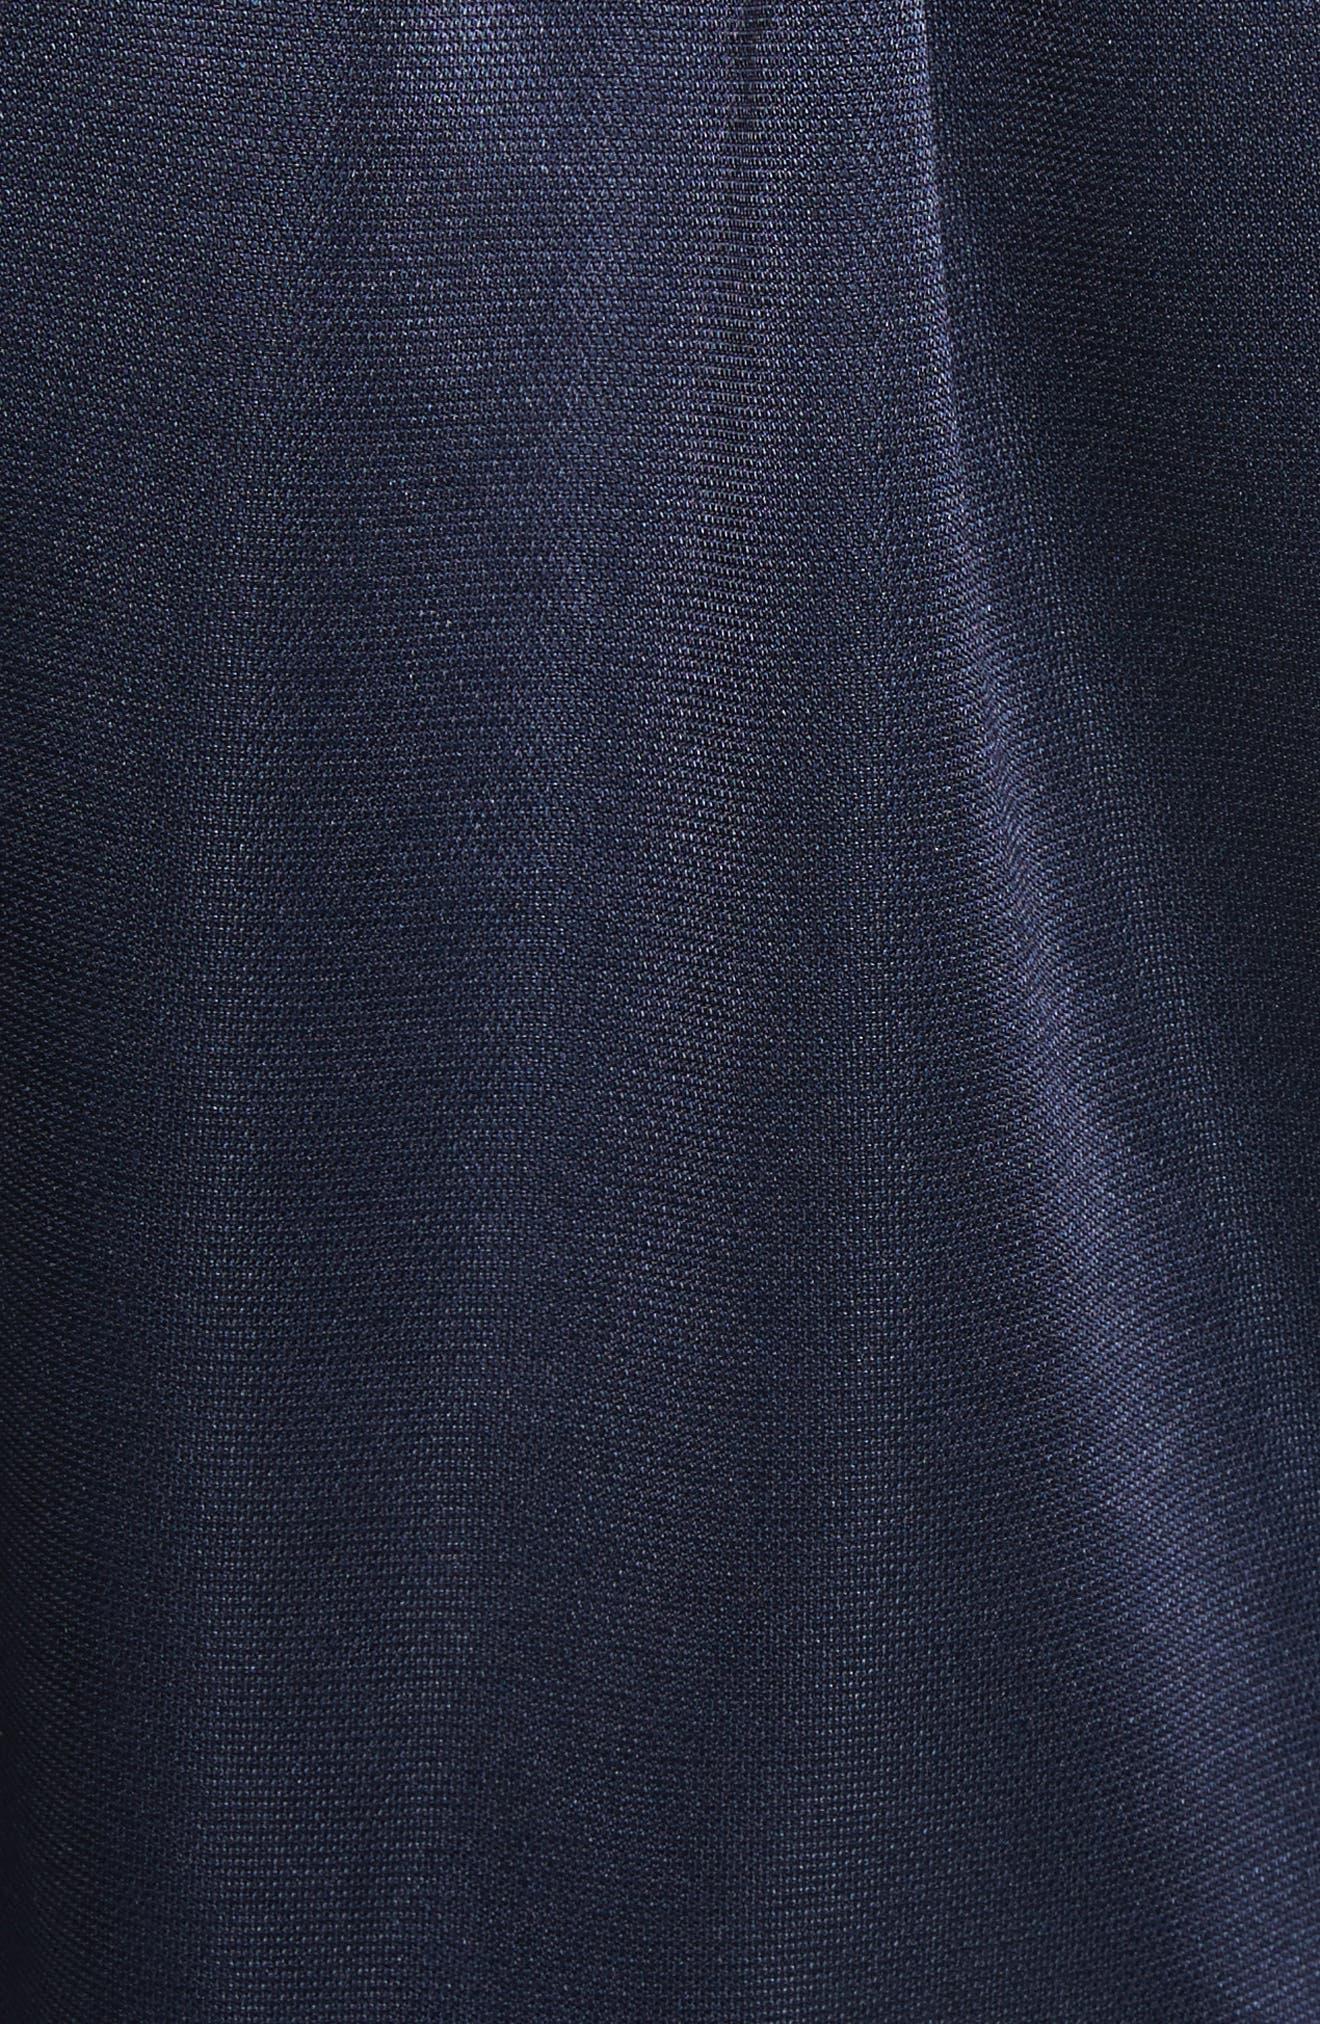 Pullover Track Jacket,                             Alternate thumbnail 5, color,                             Navy/ Green Multi